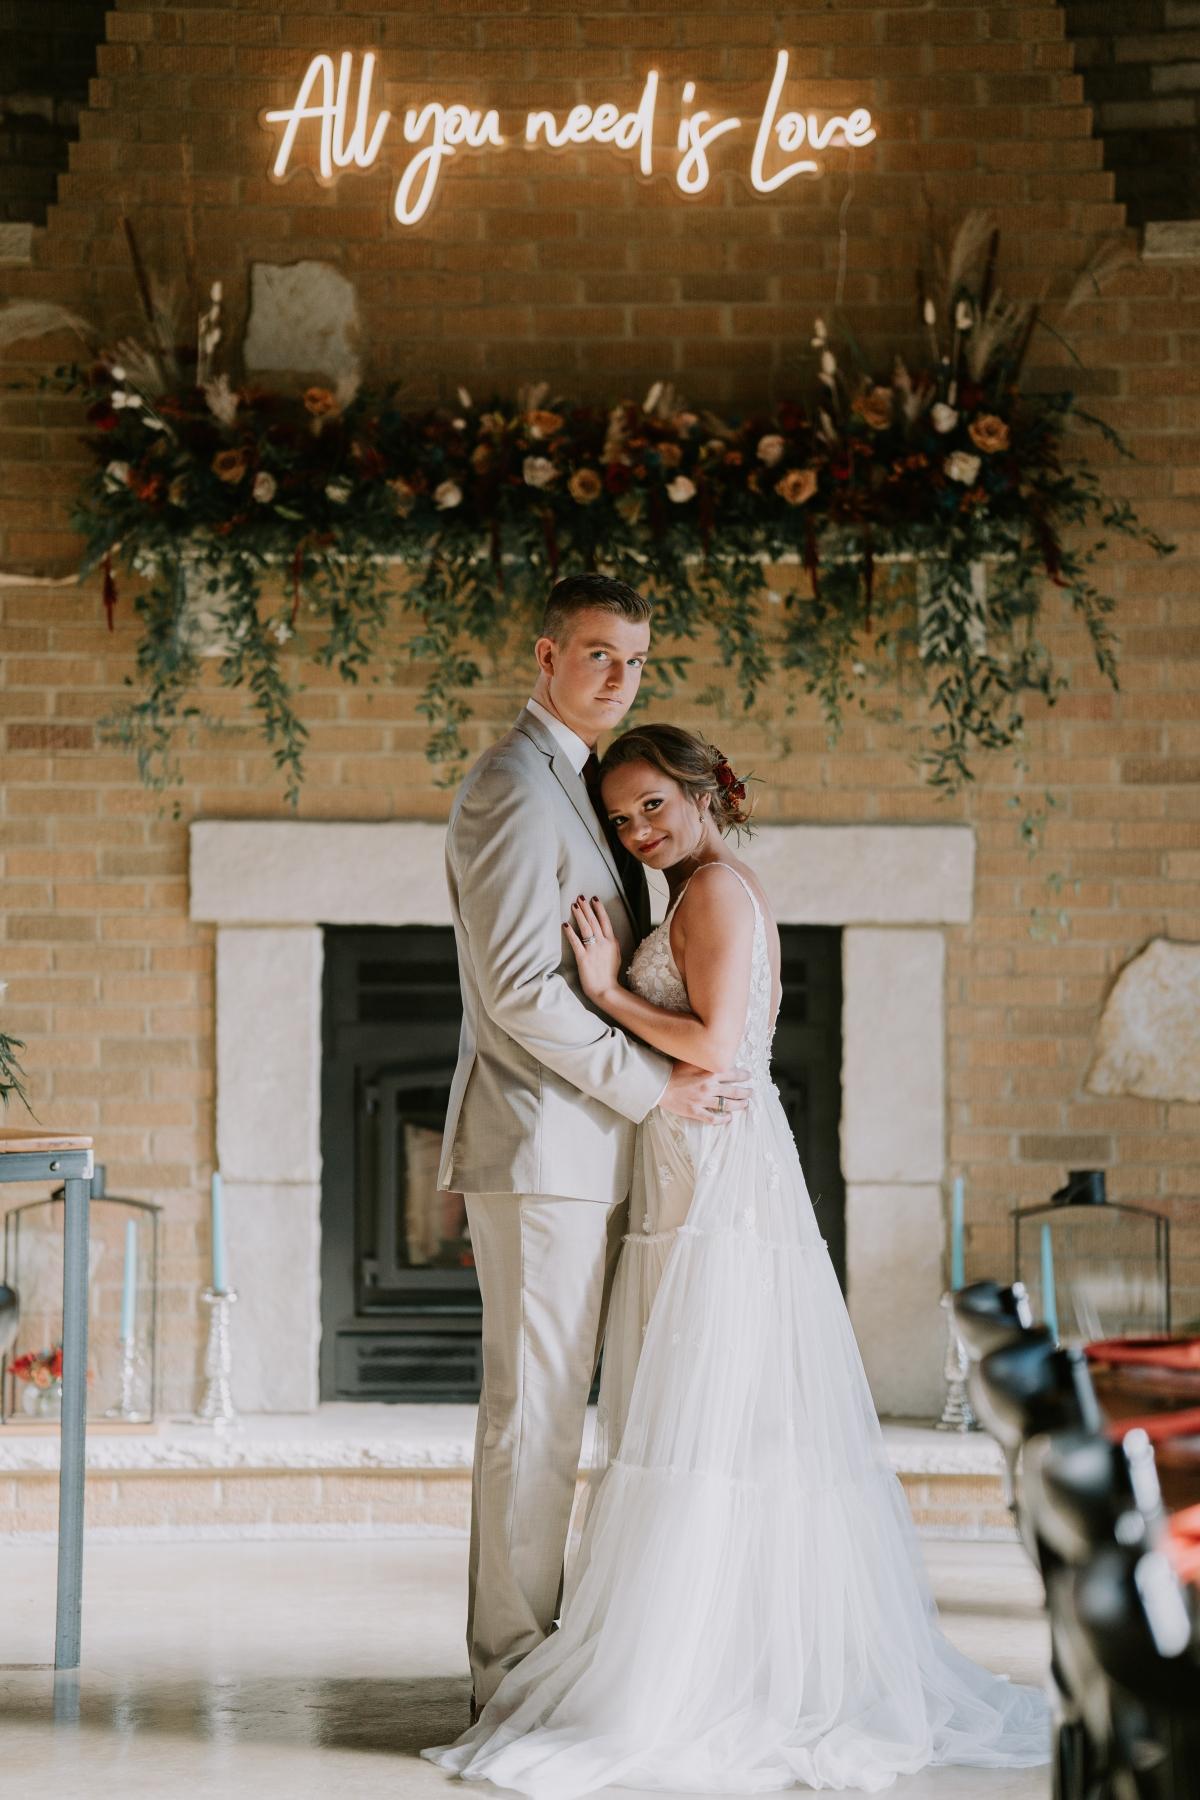 Millennium Moments Chicago Wedding Photographer 1